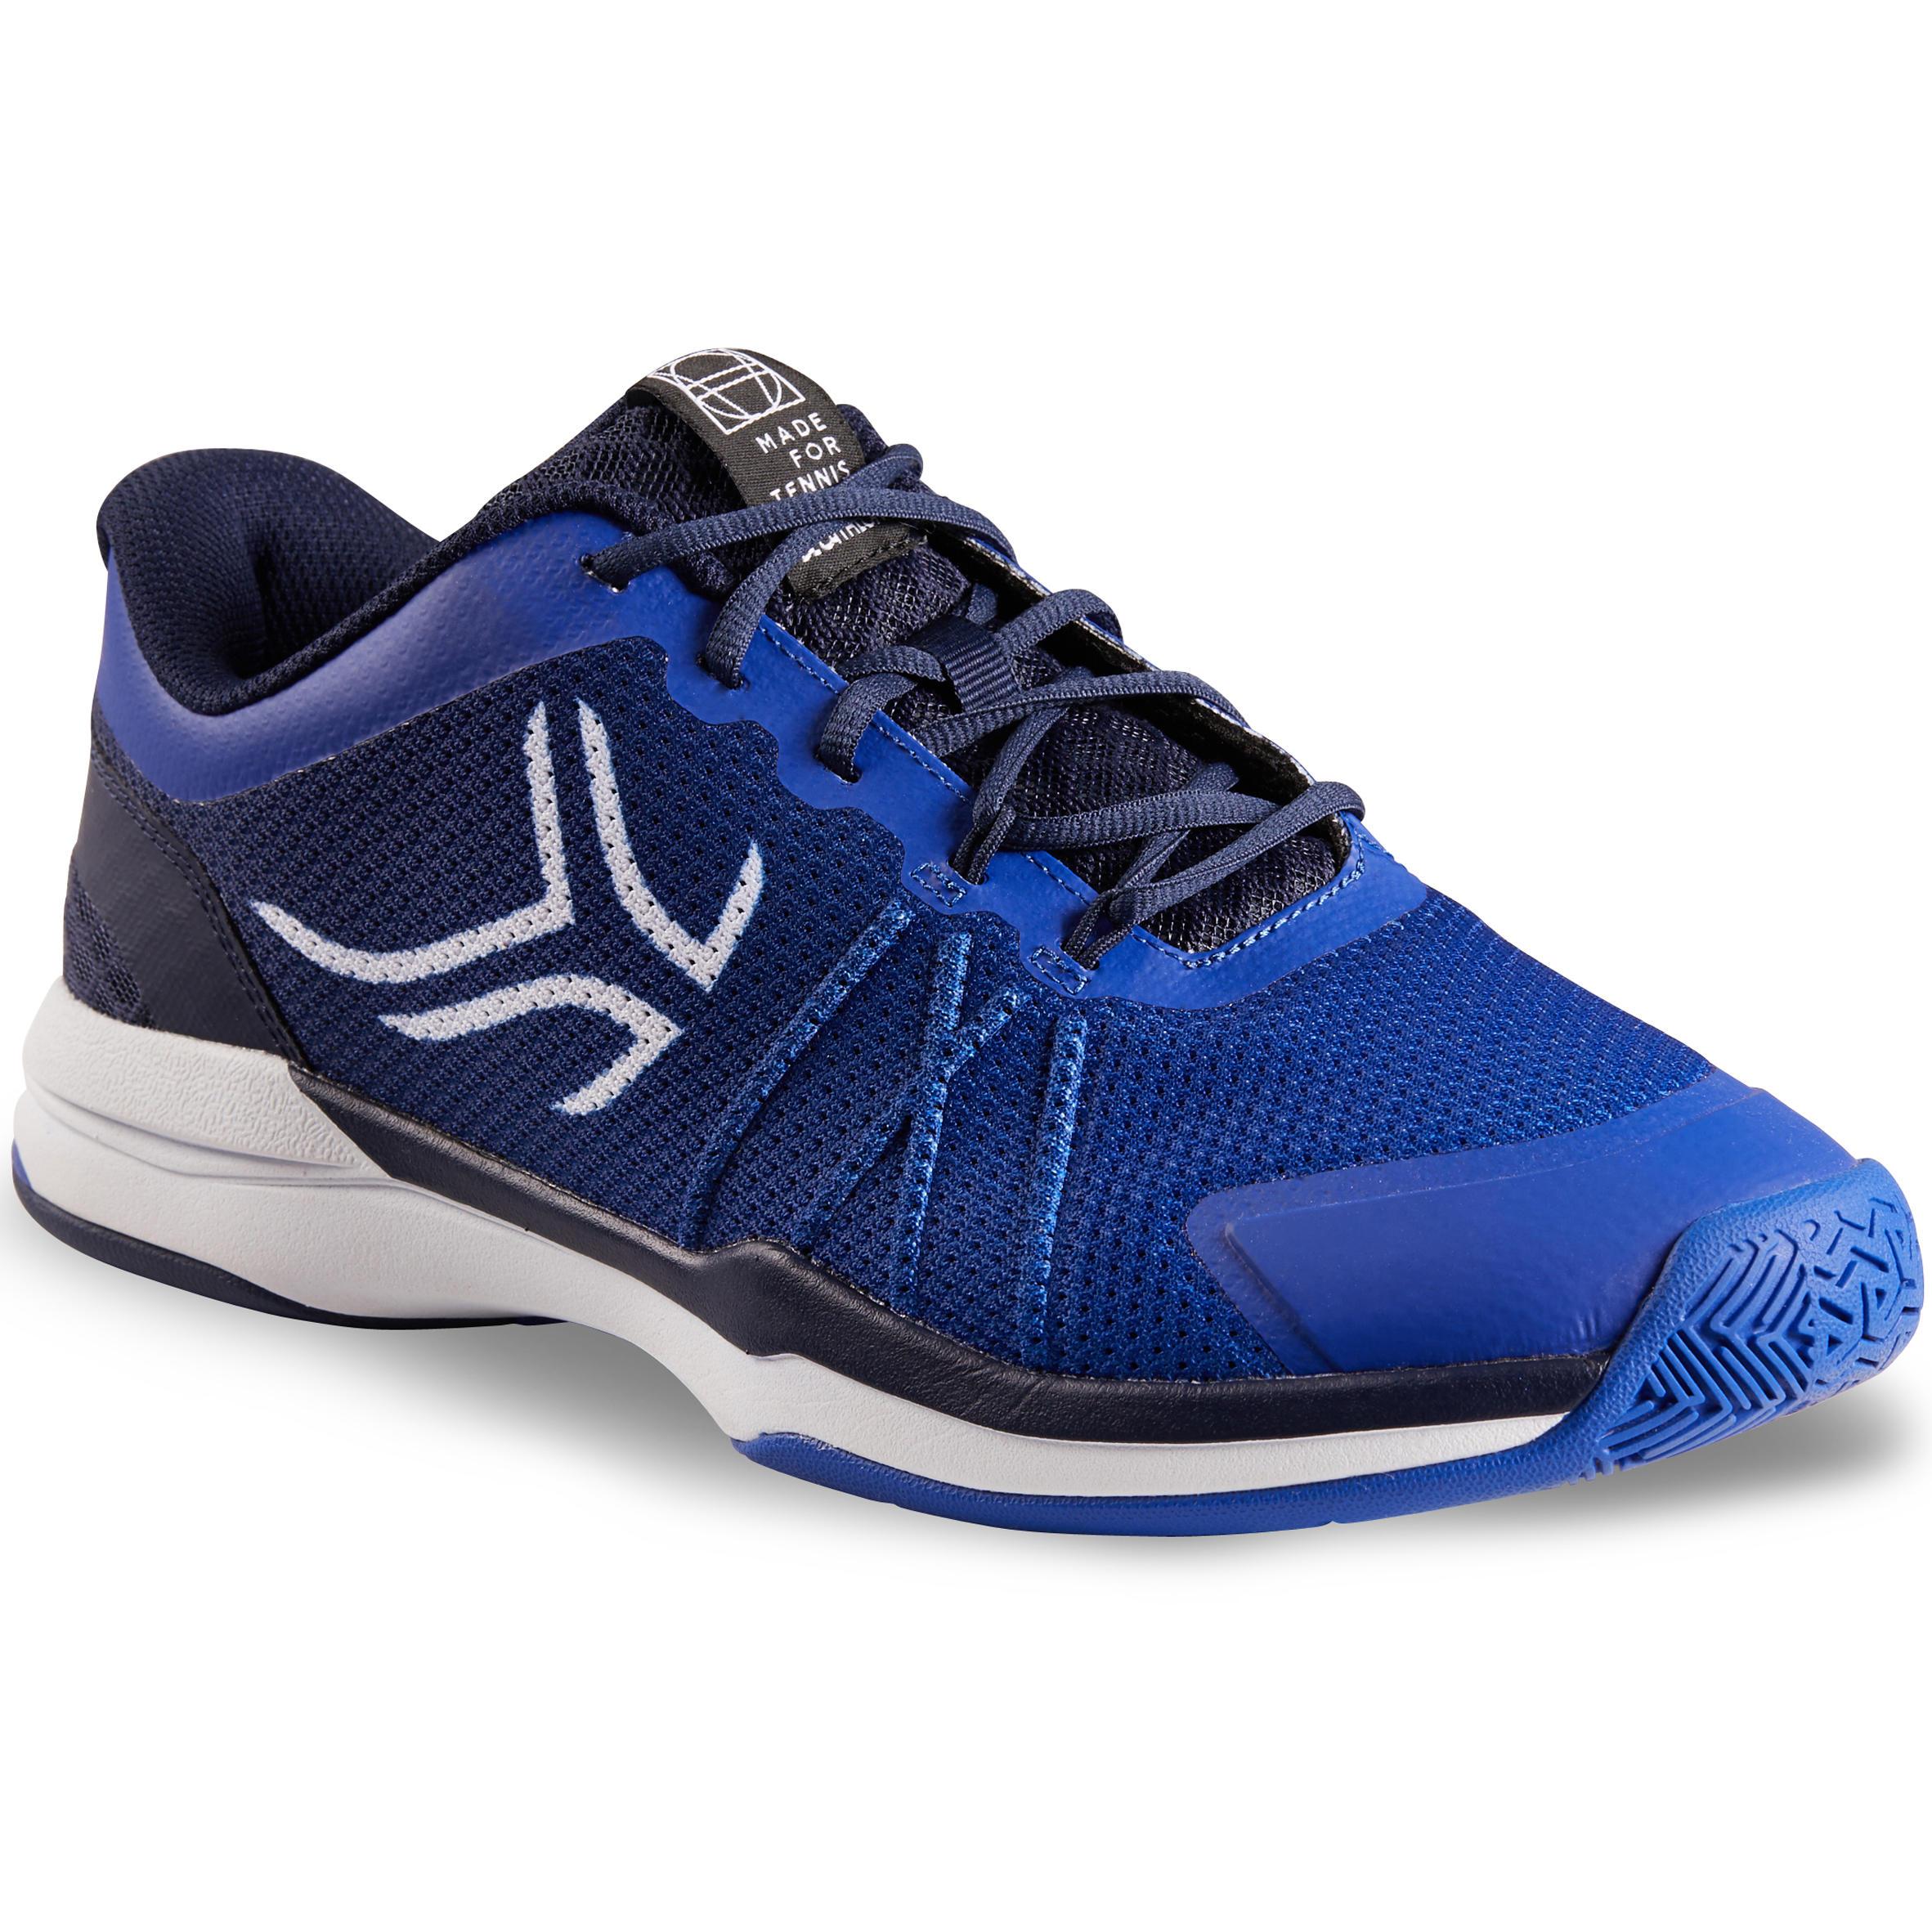 Zapatillas De Tenis Hombre Ts590 Negro Multi Court Artengo